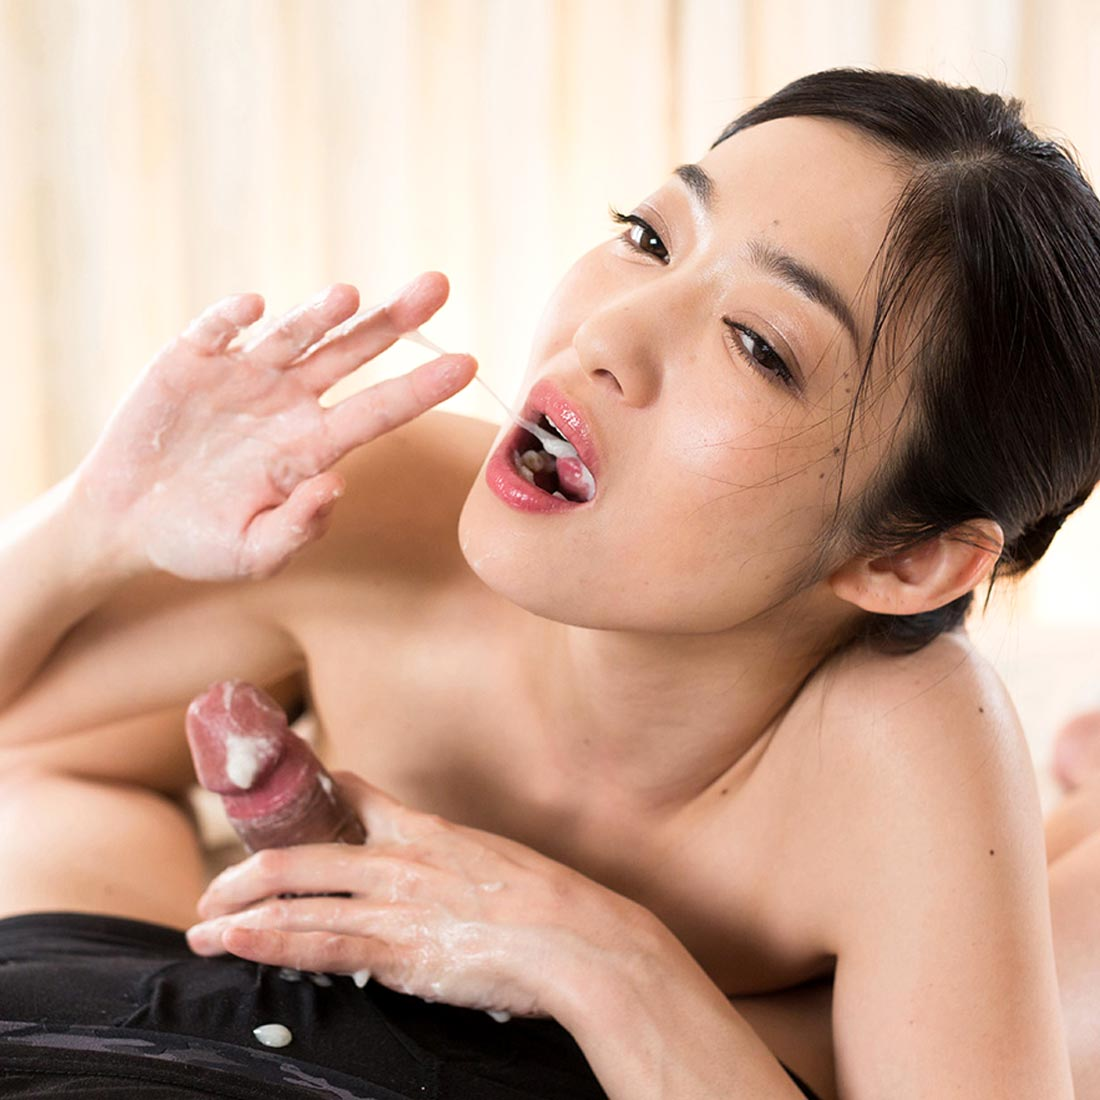 Ryu Enami nude, stroking cock for Handjob Japan. uncensored.